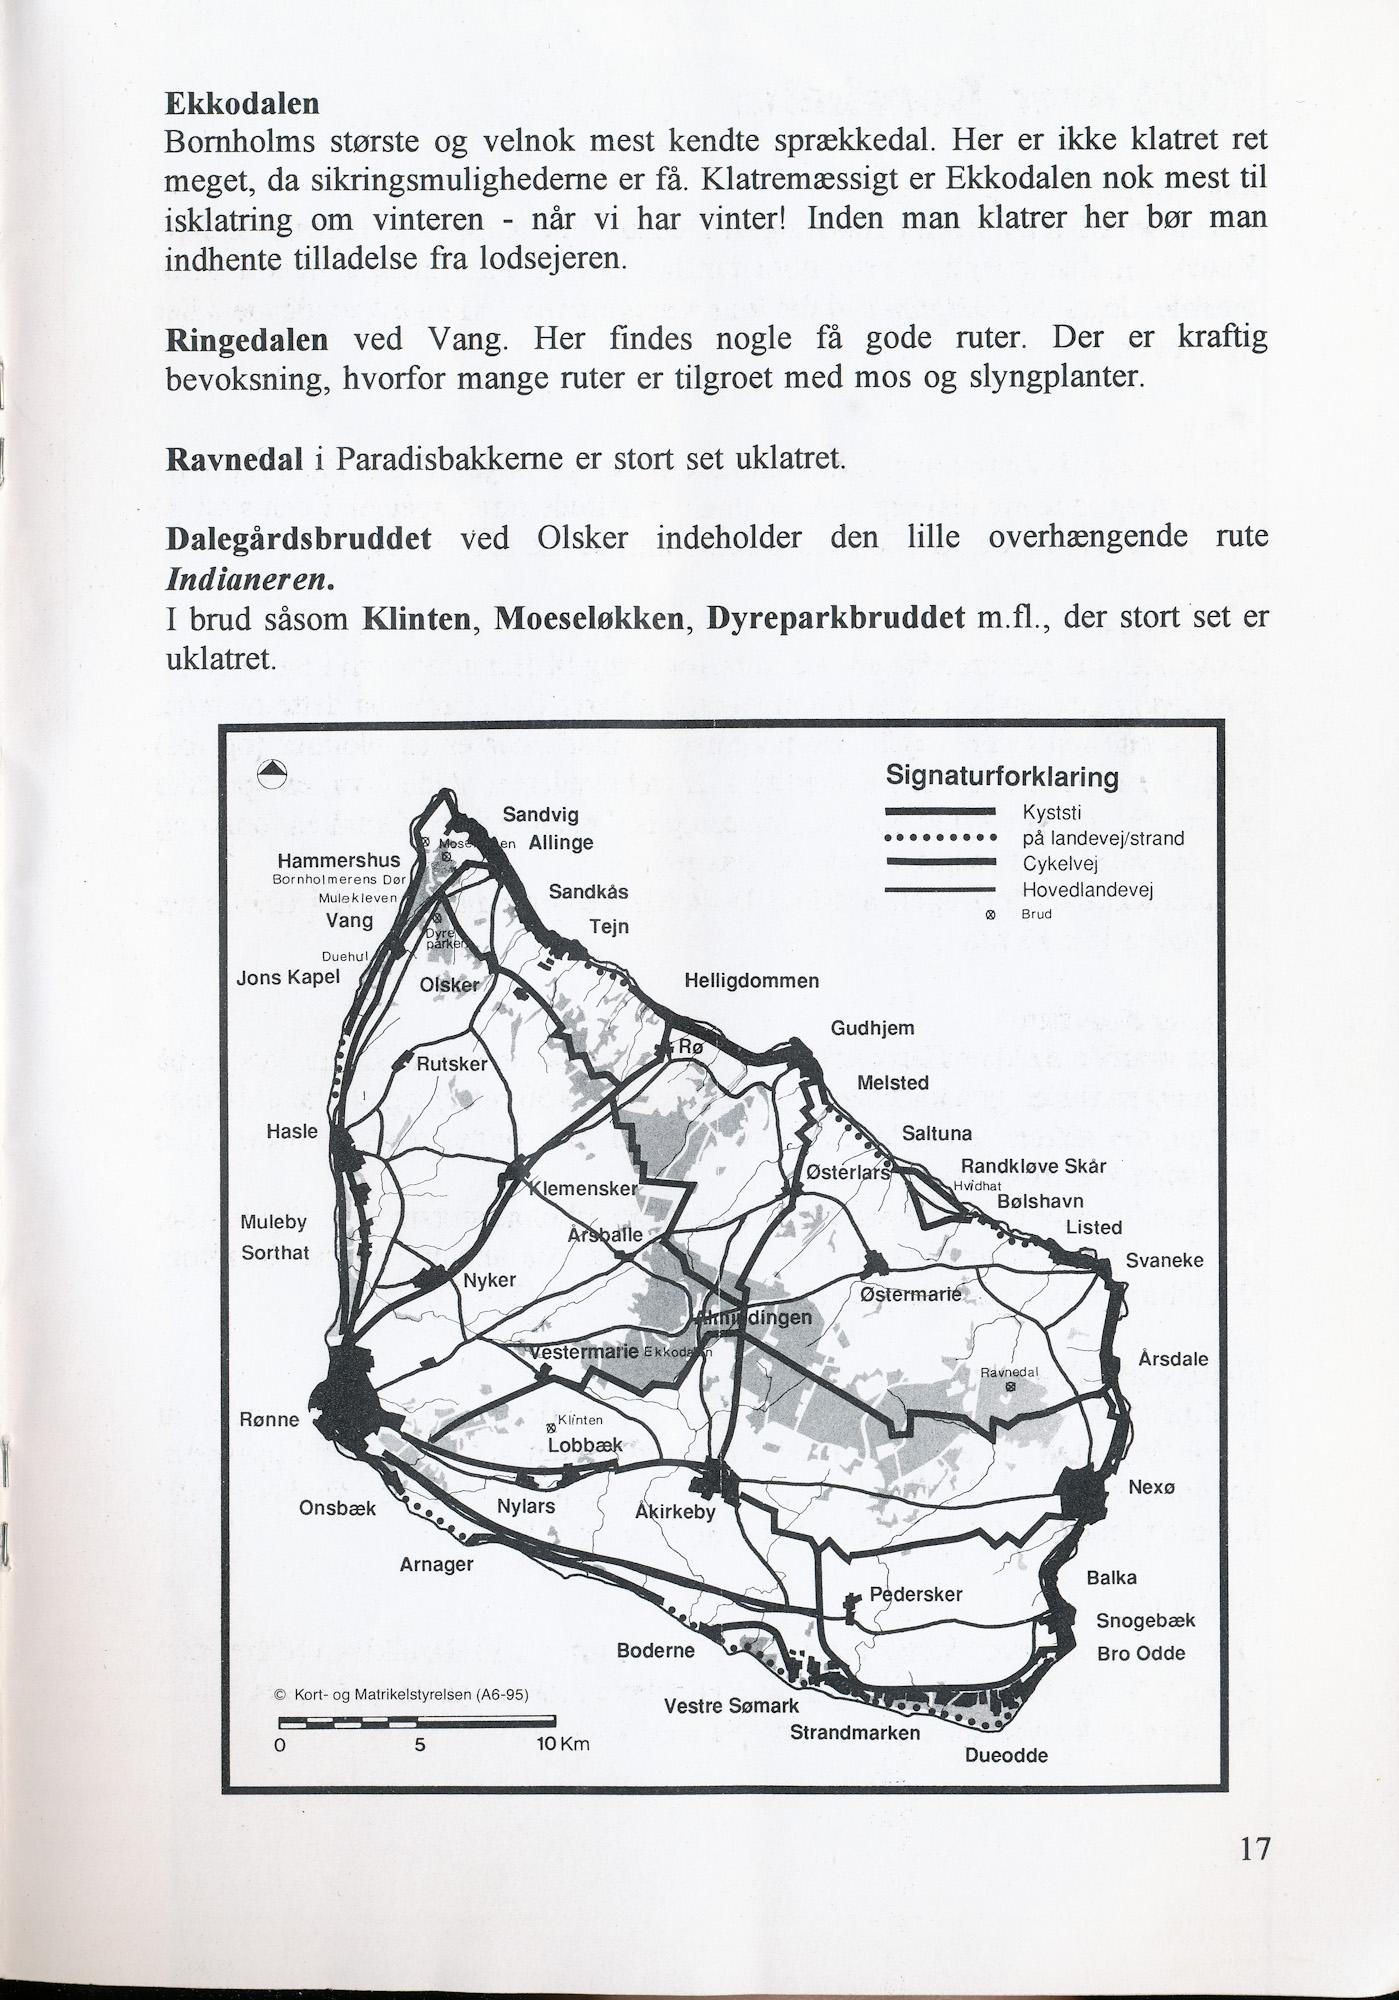 50 udvalgte ruter paa bornholm 1995 17.jpg